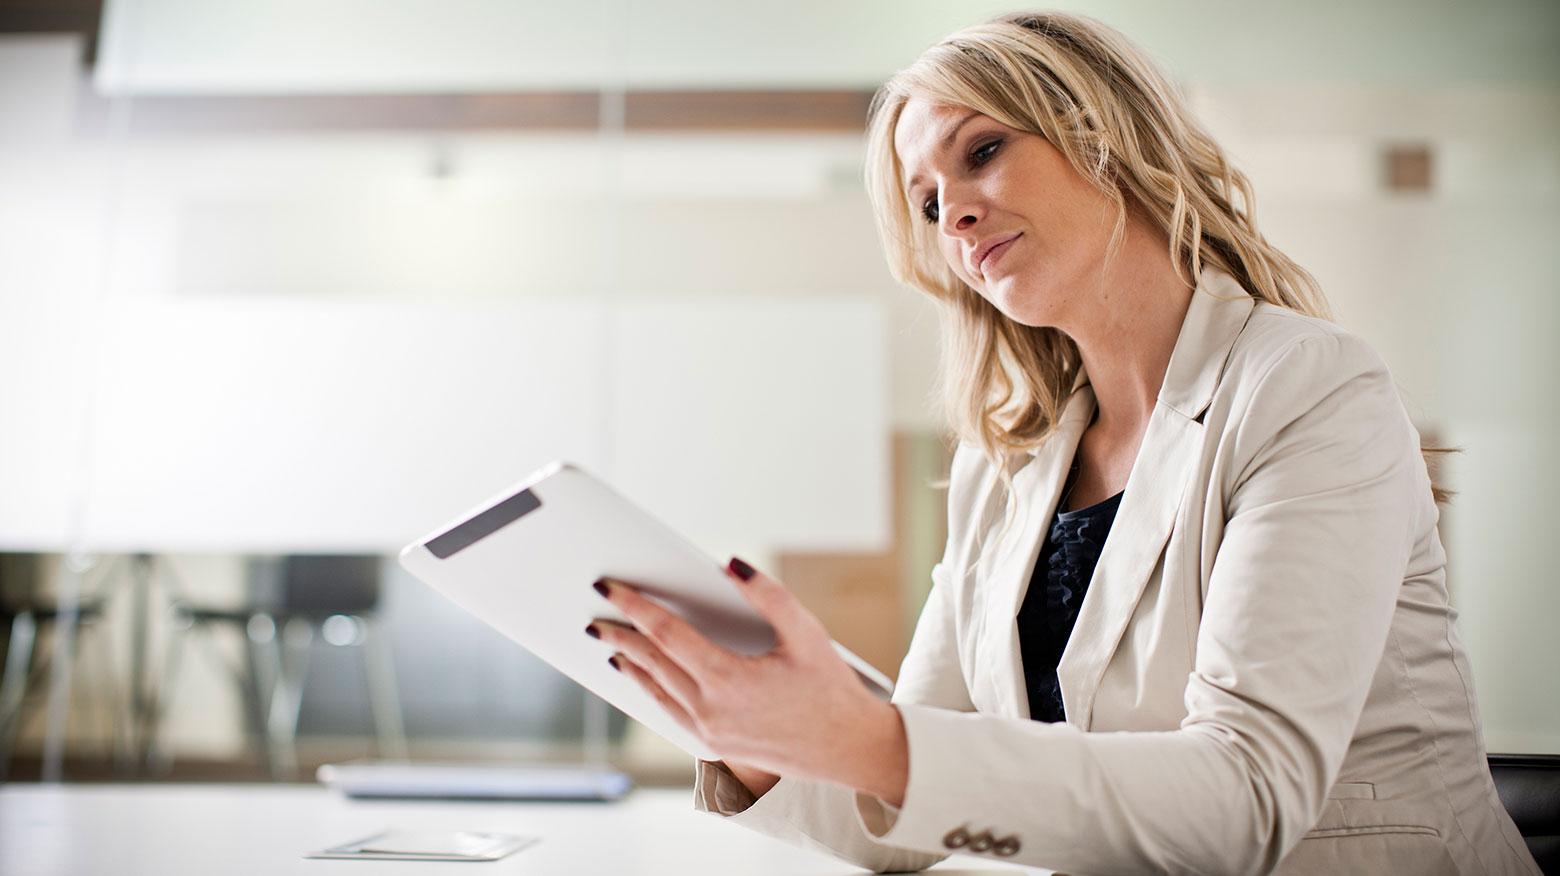 Lady using her iPad